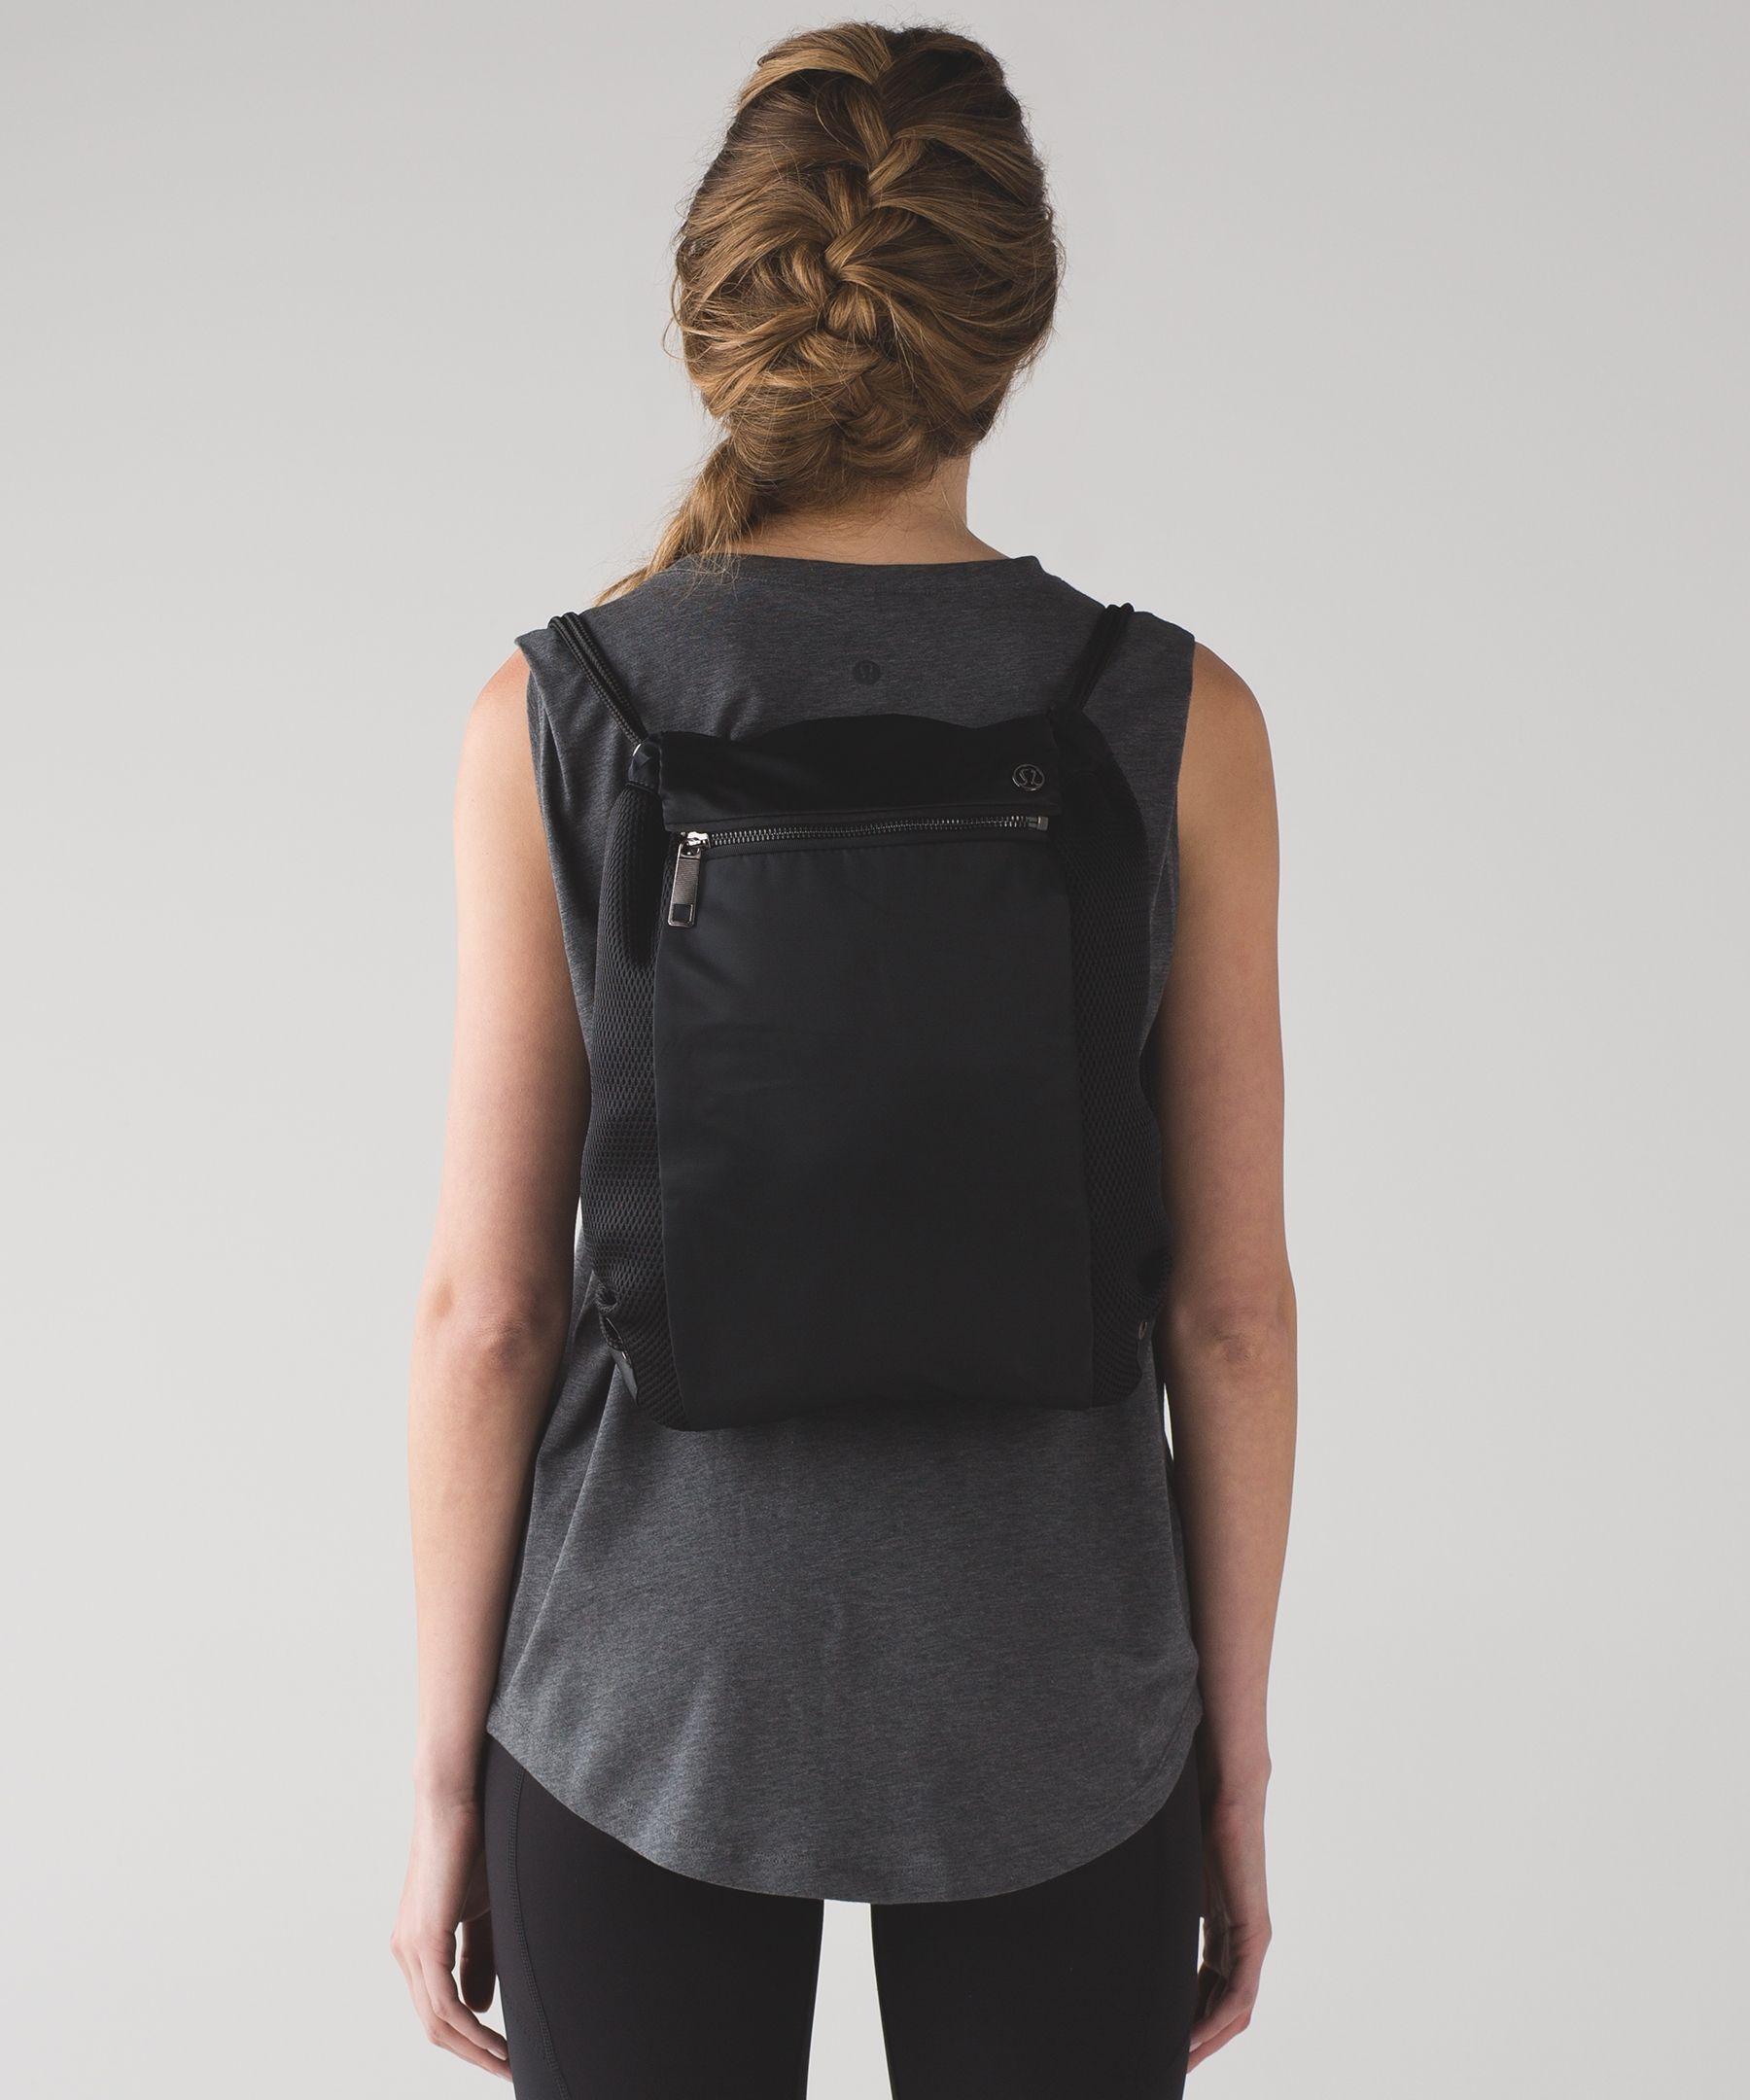 Women s Backpack - (Black e3f1c5a1d